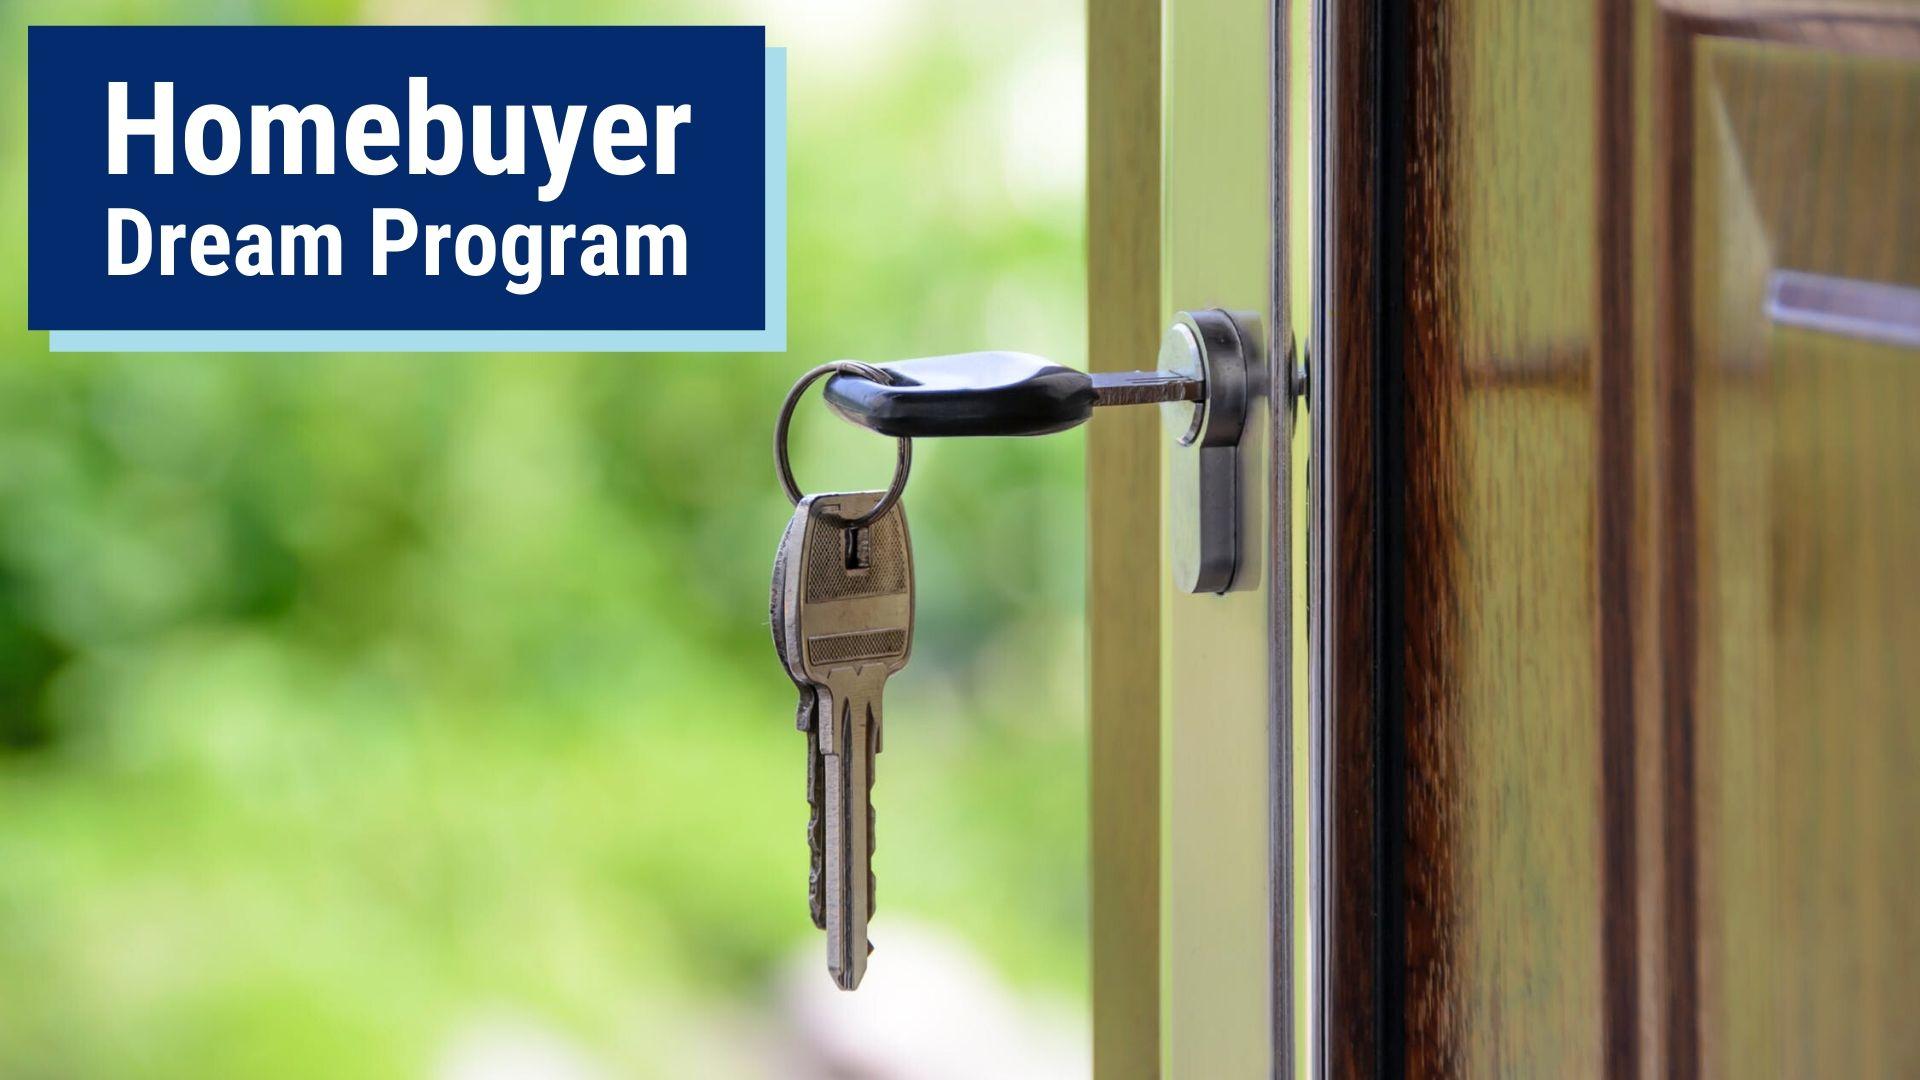 seneca savings federal grant homebuyer dream program first time home buyers